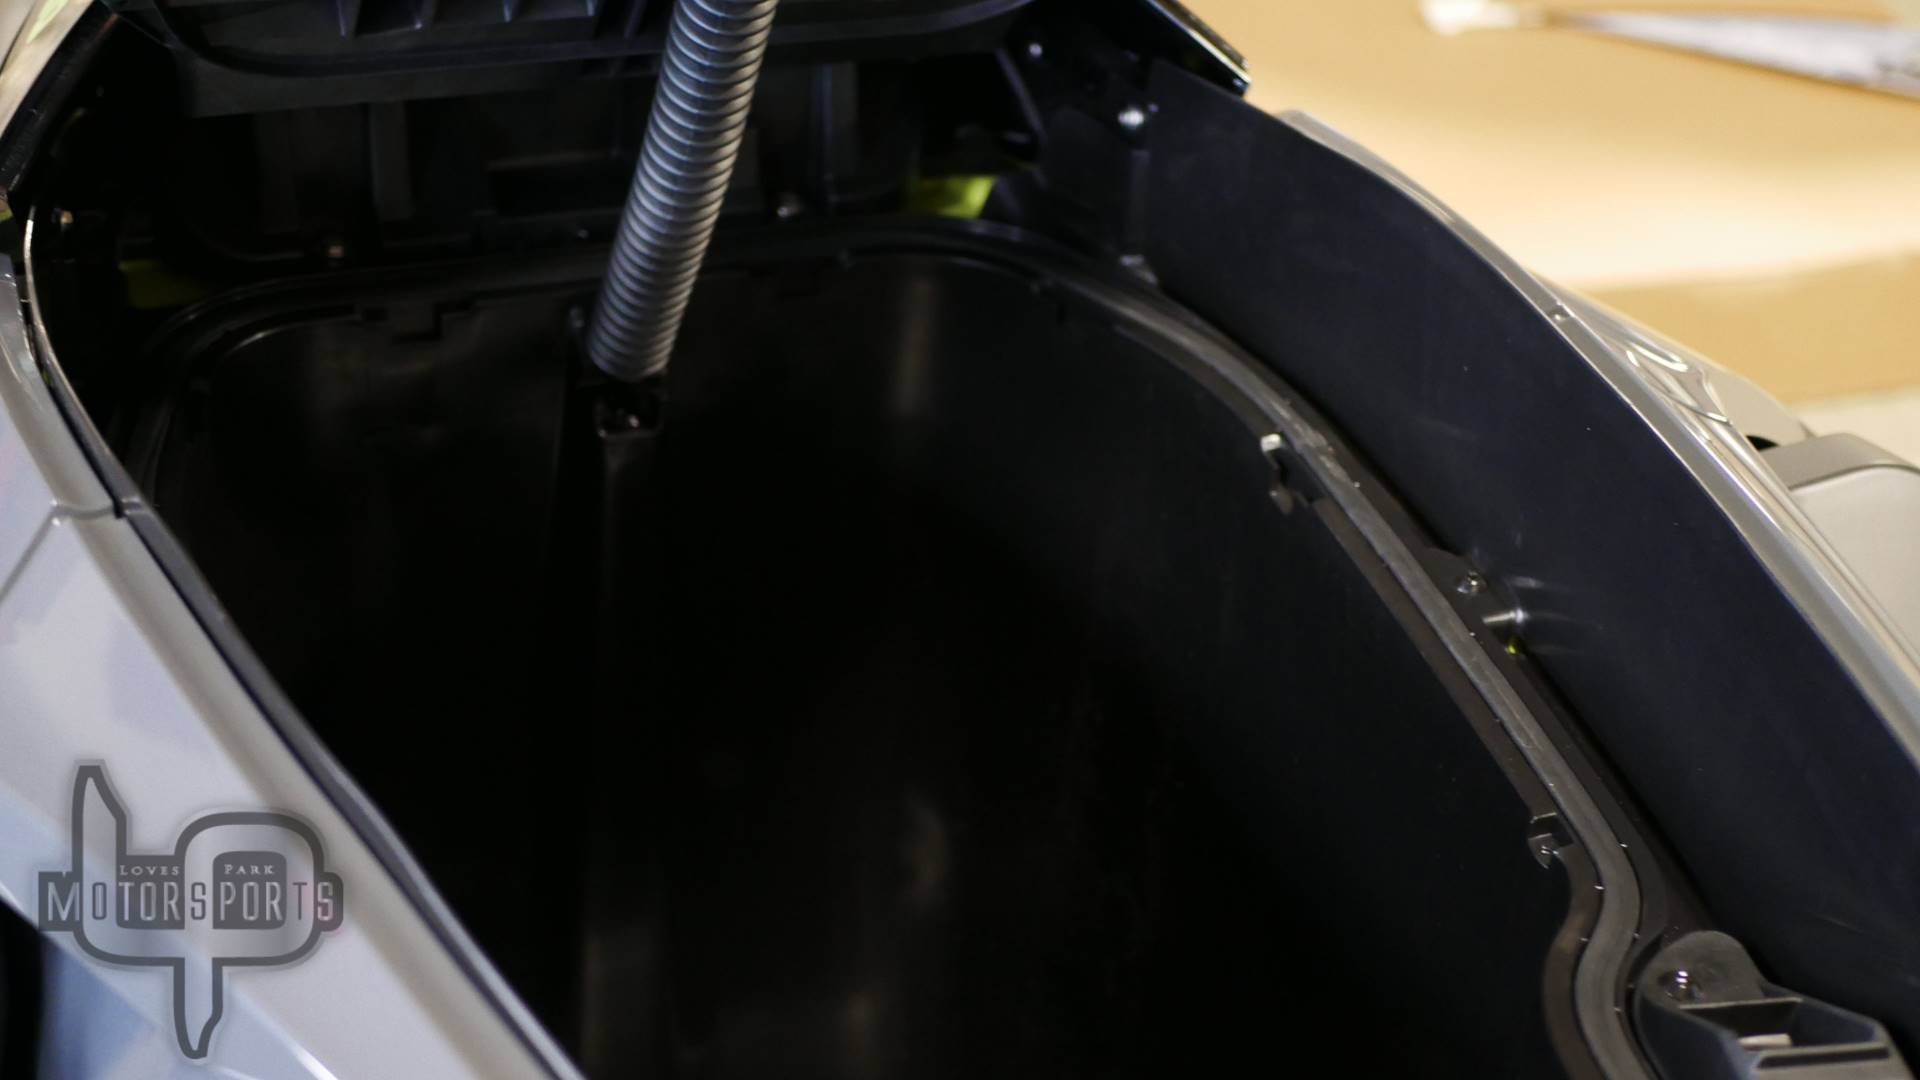 2019 Sea-Doo RXT-X 300 iBR + Sound System in Roscoe, Illinois